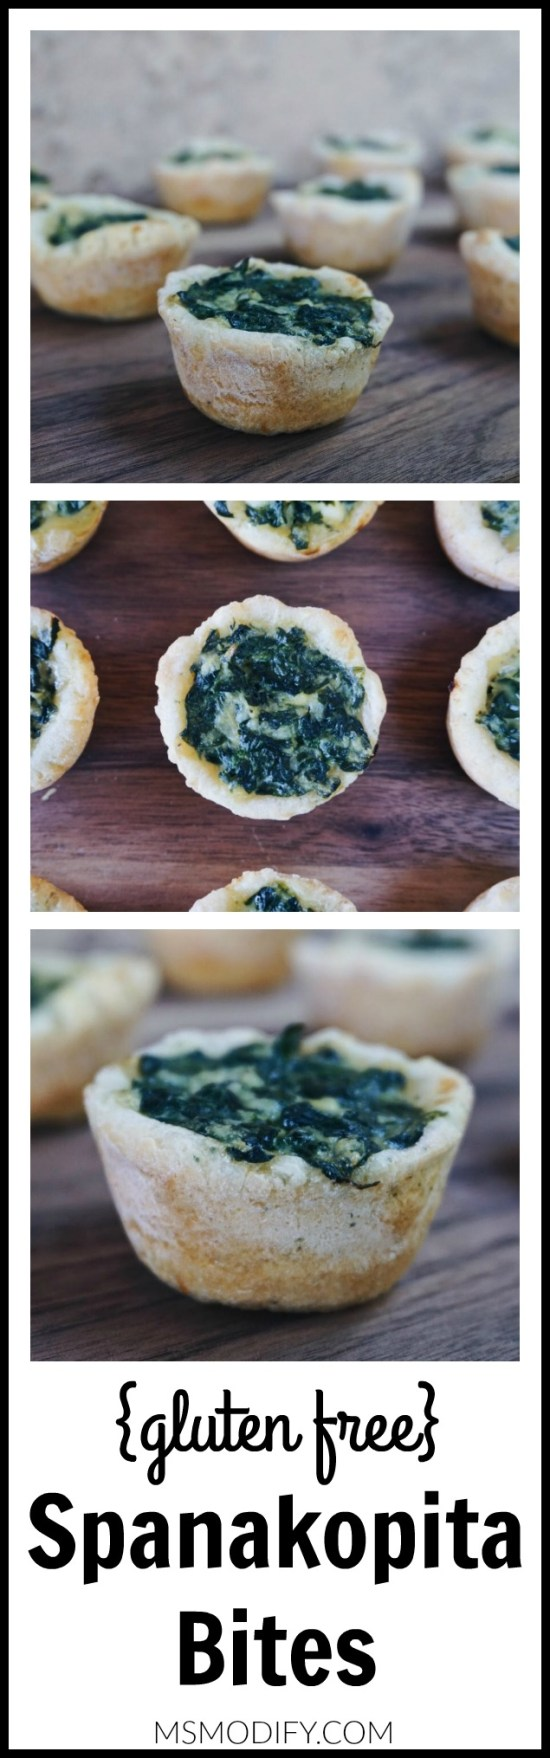 Gluten free Spanakopita bites